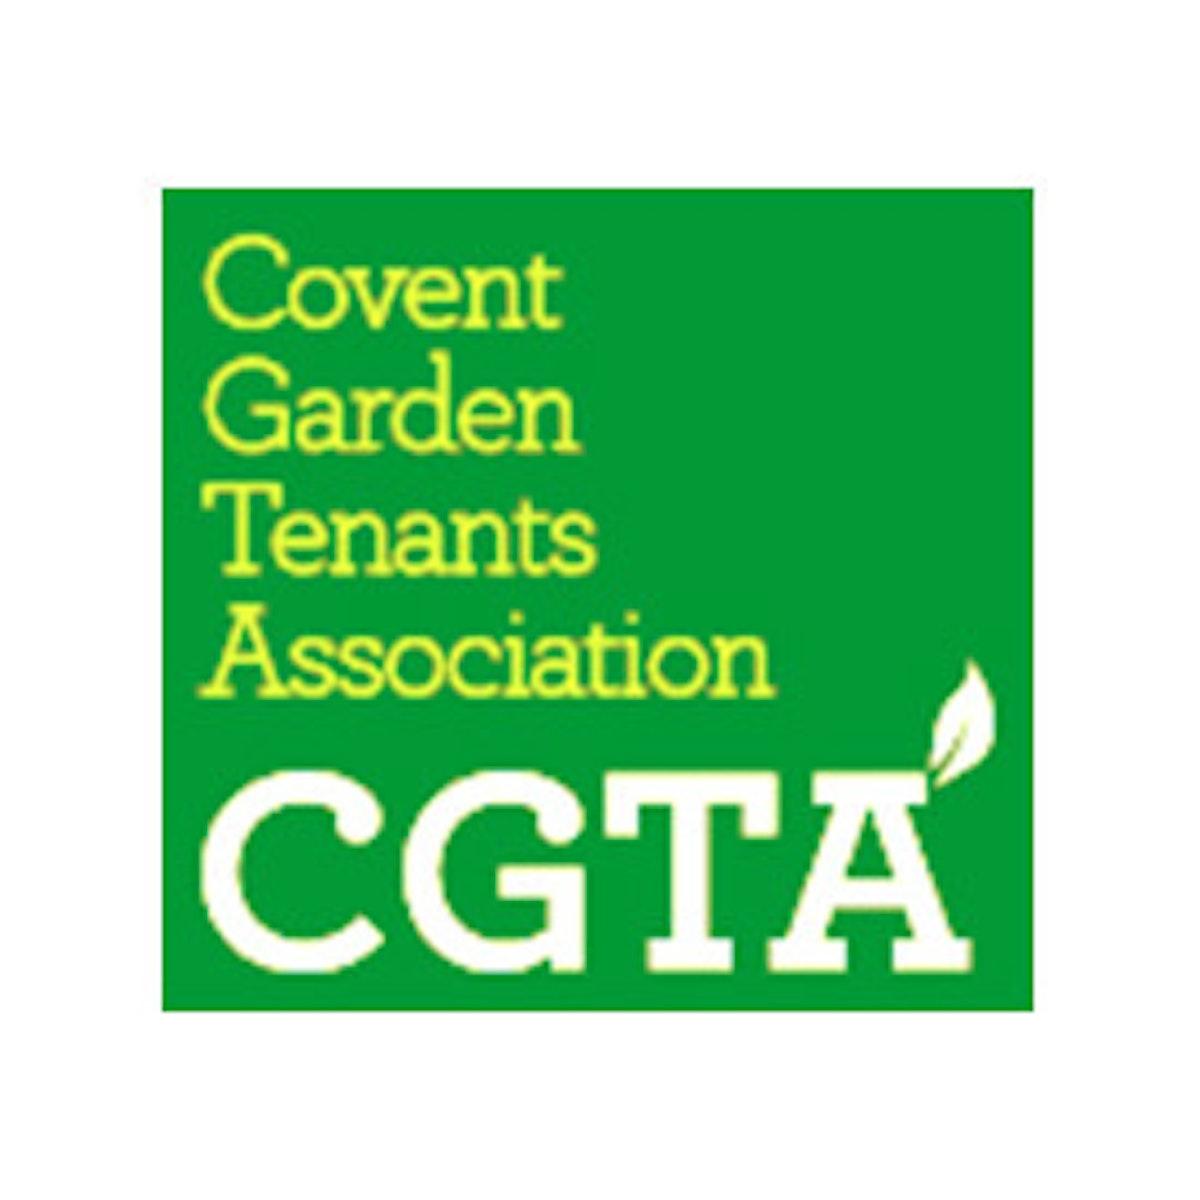 Covent Garden Tenants' Association